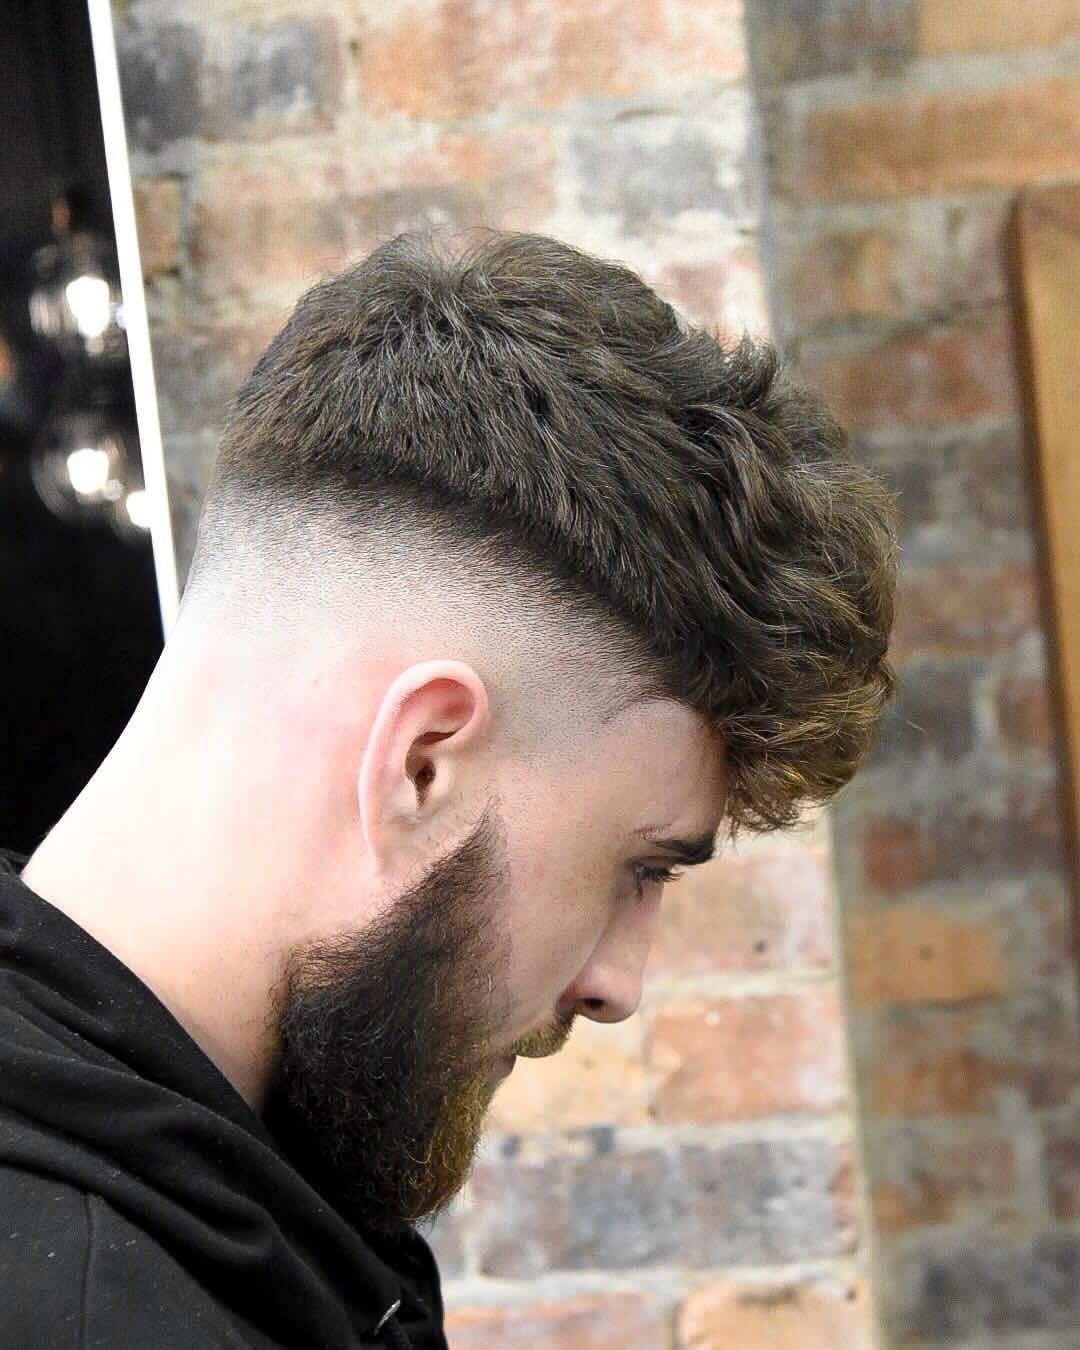 Simple Regular Clean Cut Haircuts for Men  Best Hairstyles